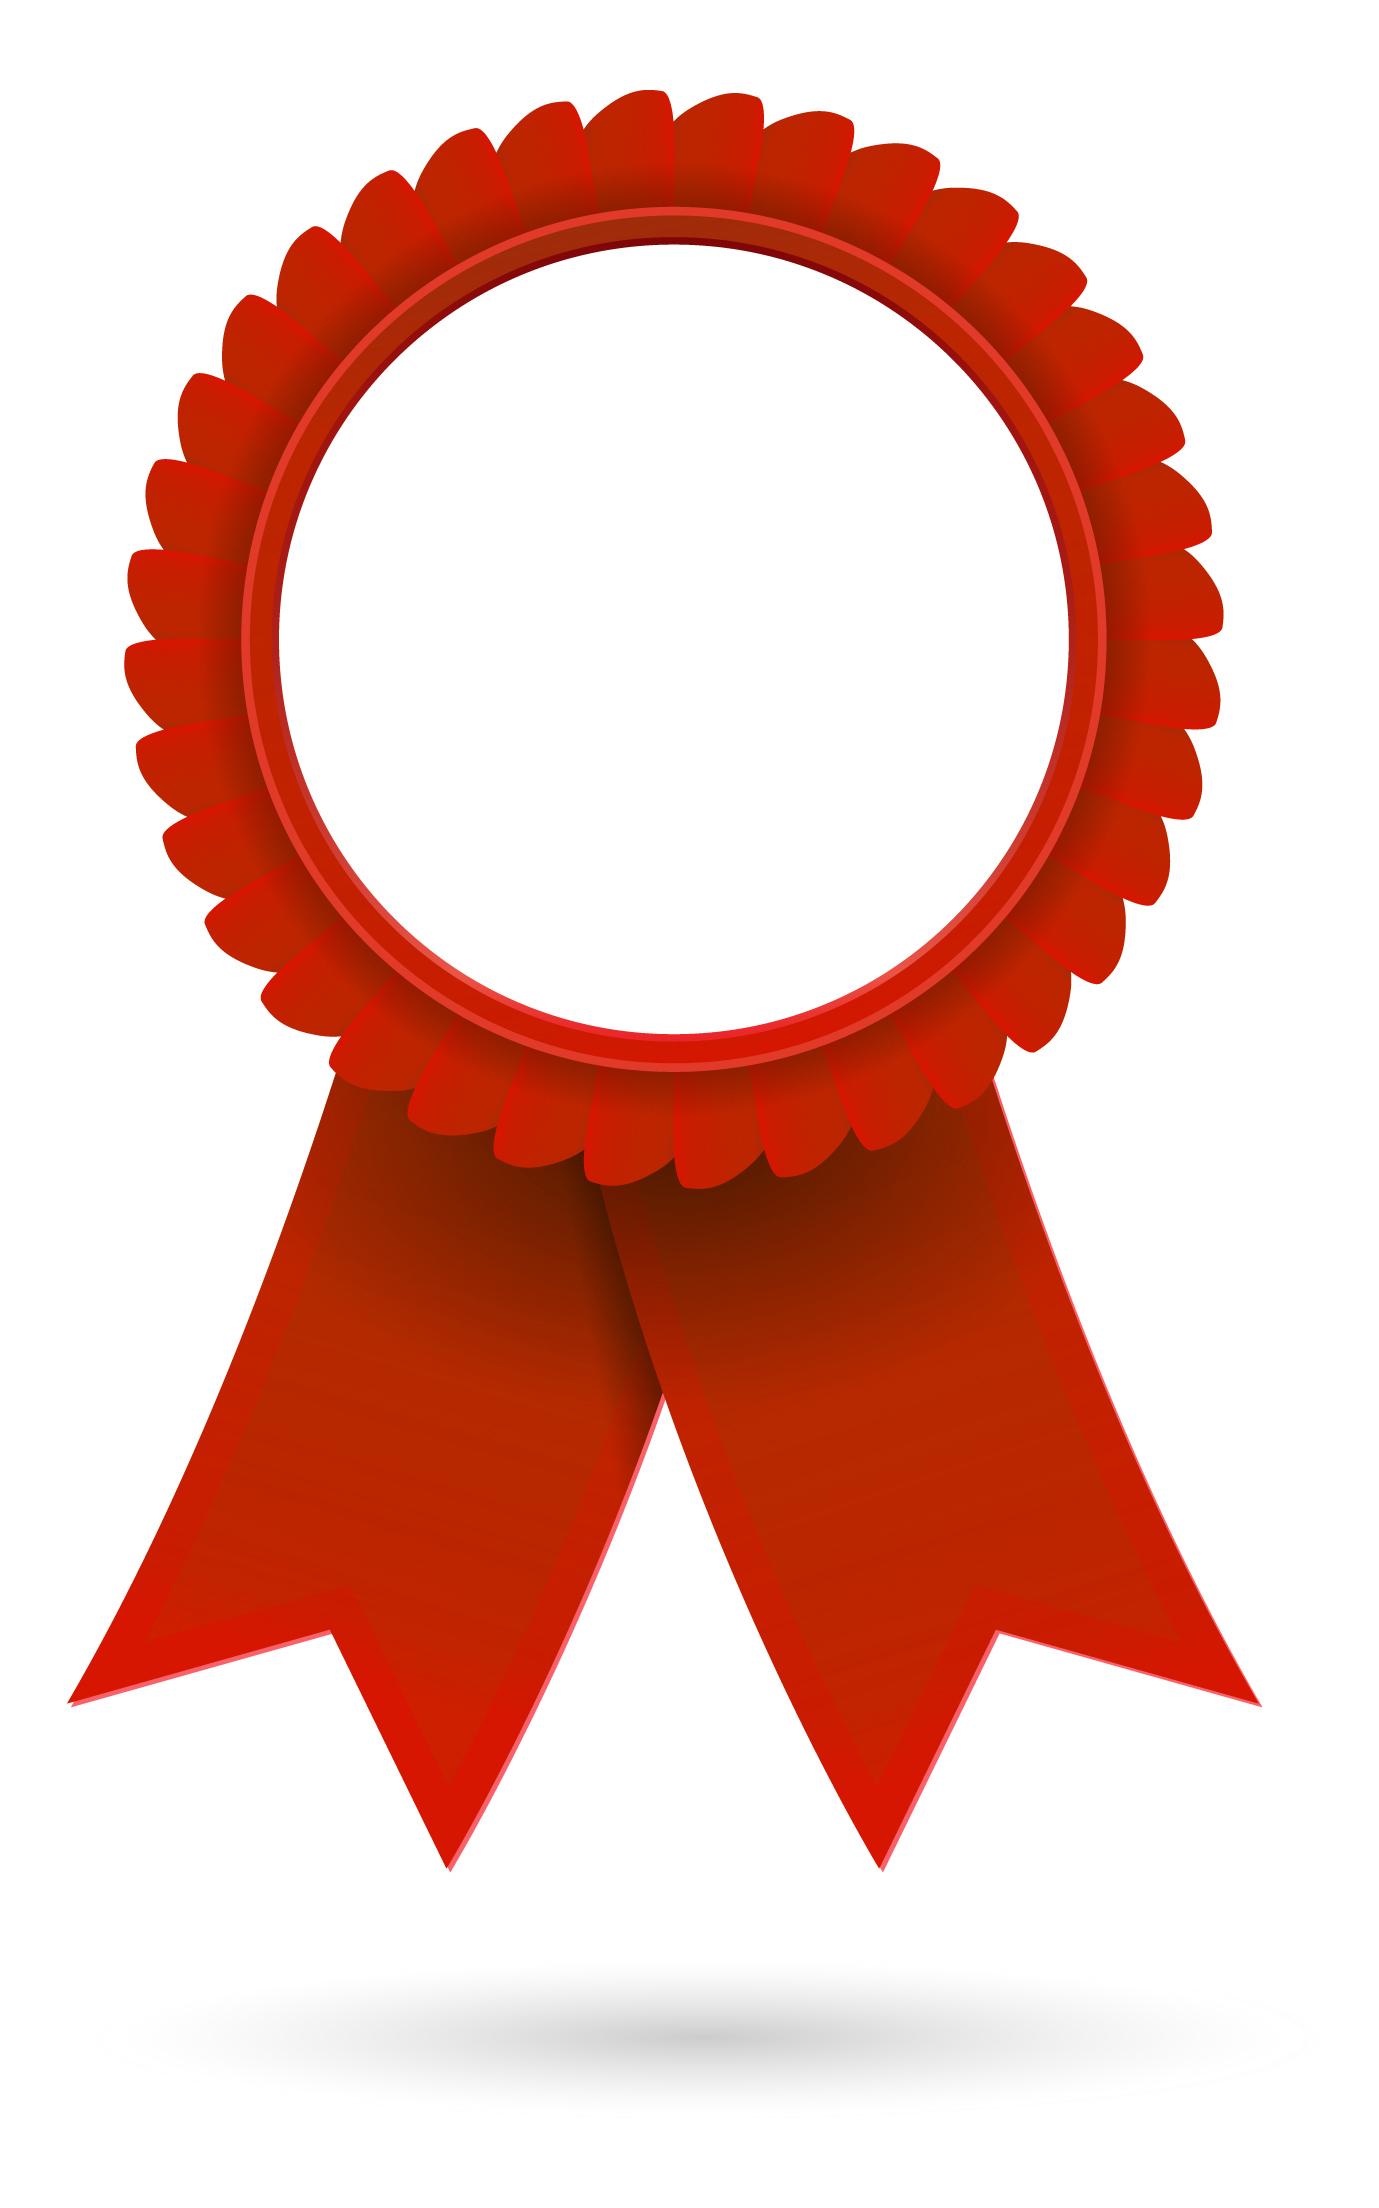 Red Award Ribbon Clipart #1-Red Award Ribbon Clipart #1-8